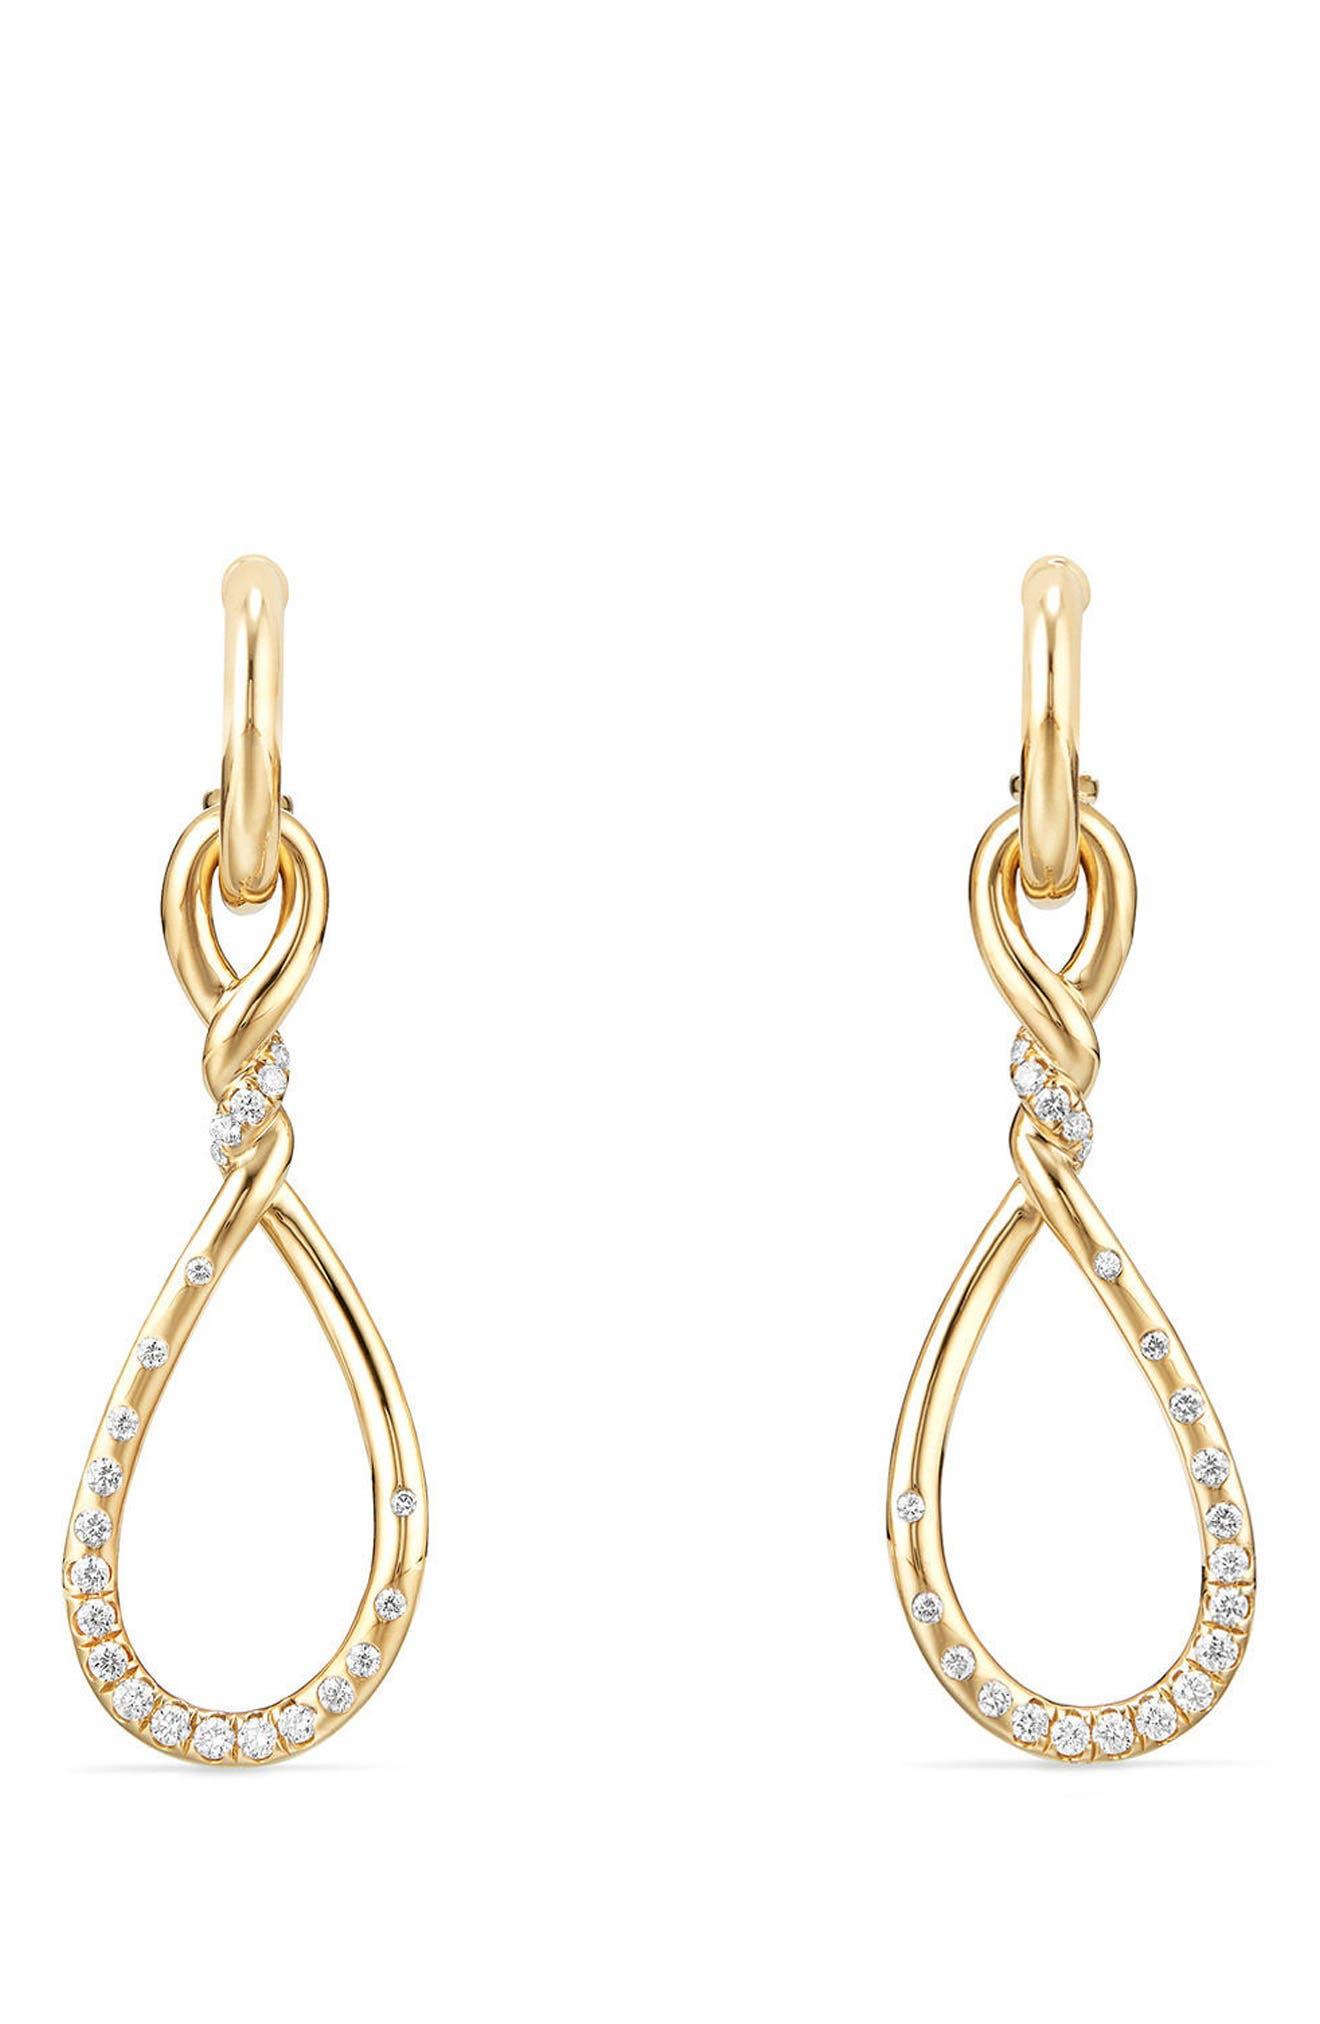 Main Image - David Yurman Continuance Medium Drop Earrings with Diamonds in 18K Gold